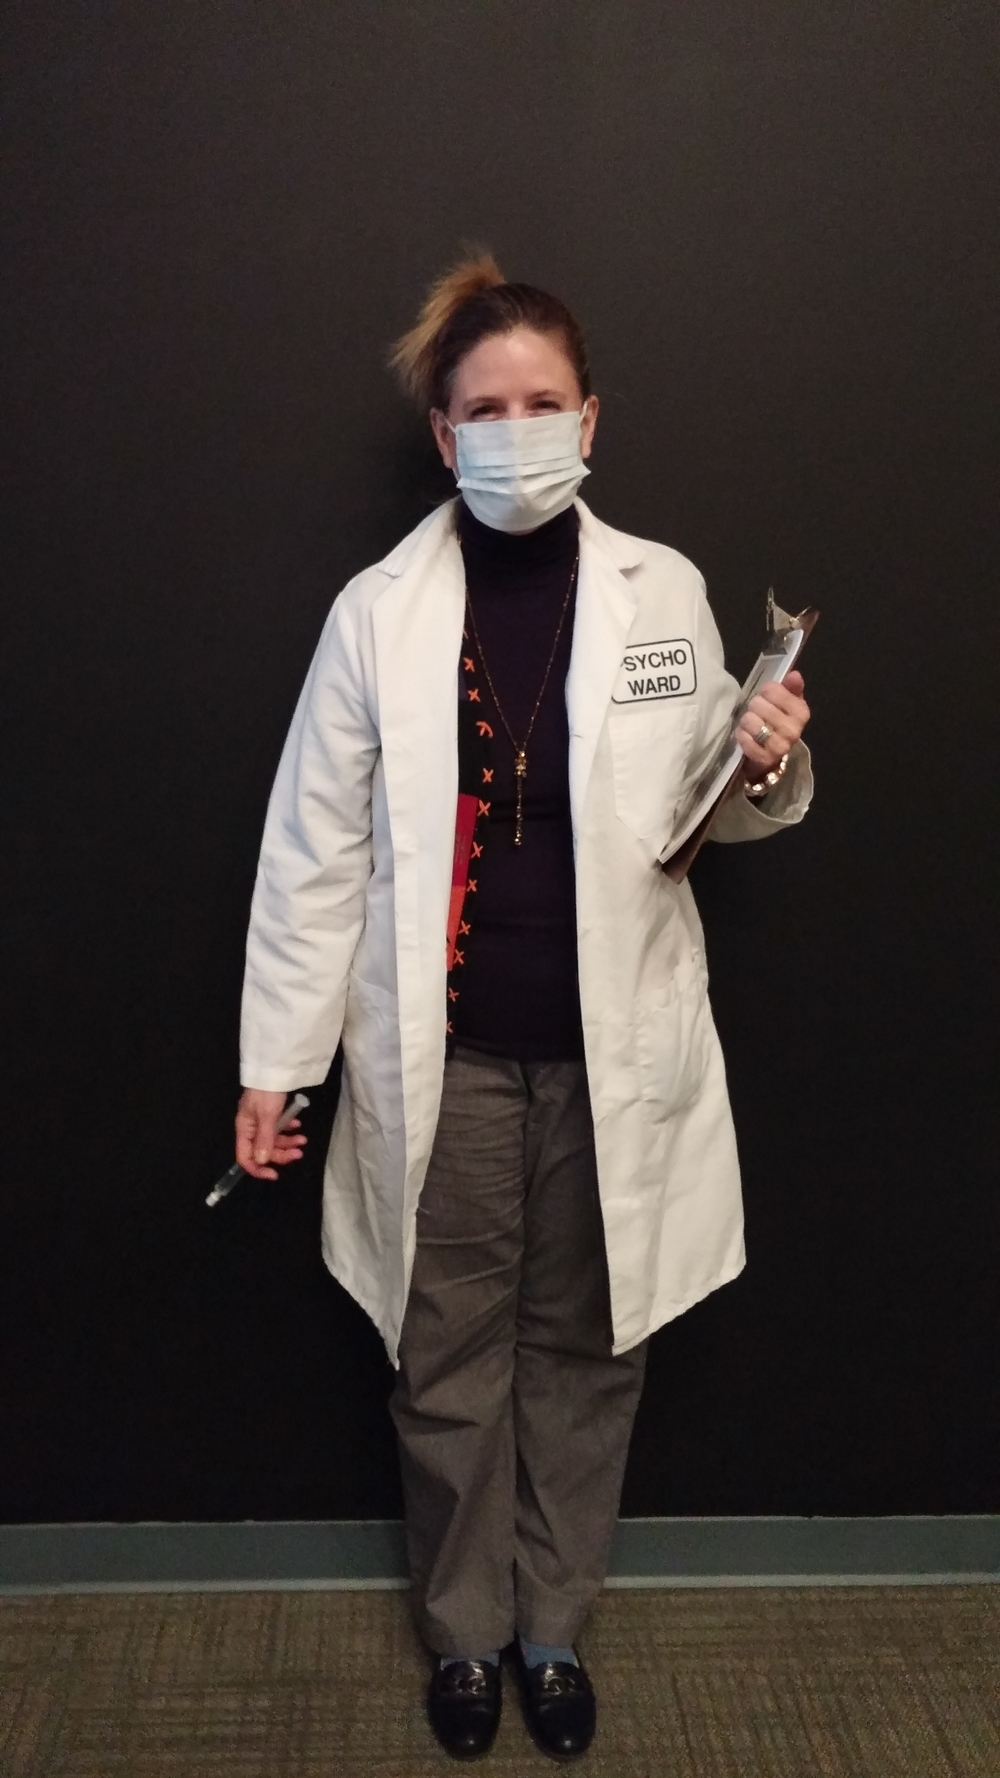 Nancy was Doctor